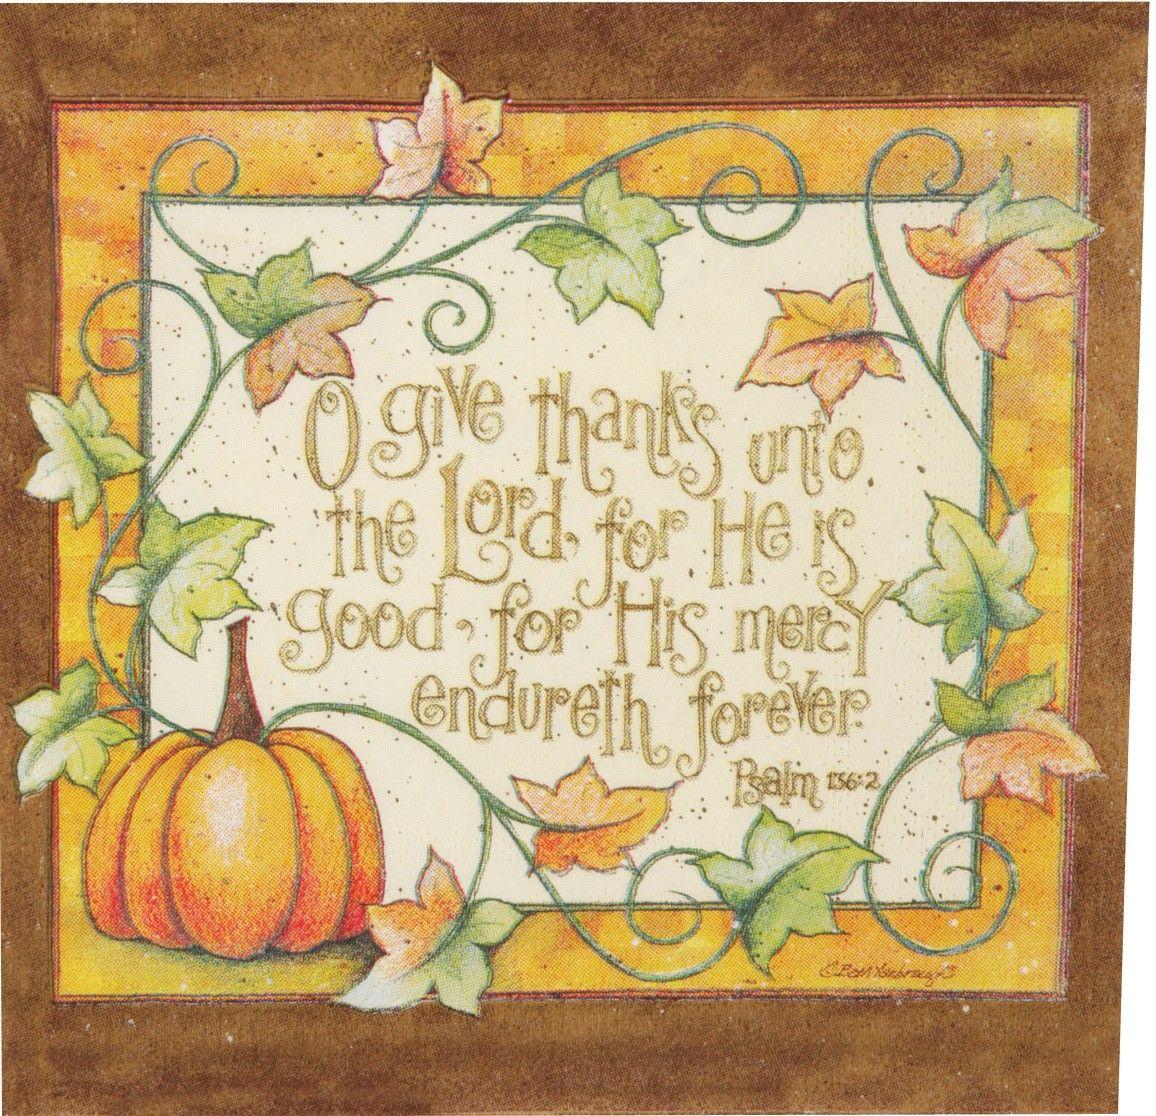 Thanksgiving napkins Inspirational scripture, Holiday